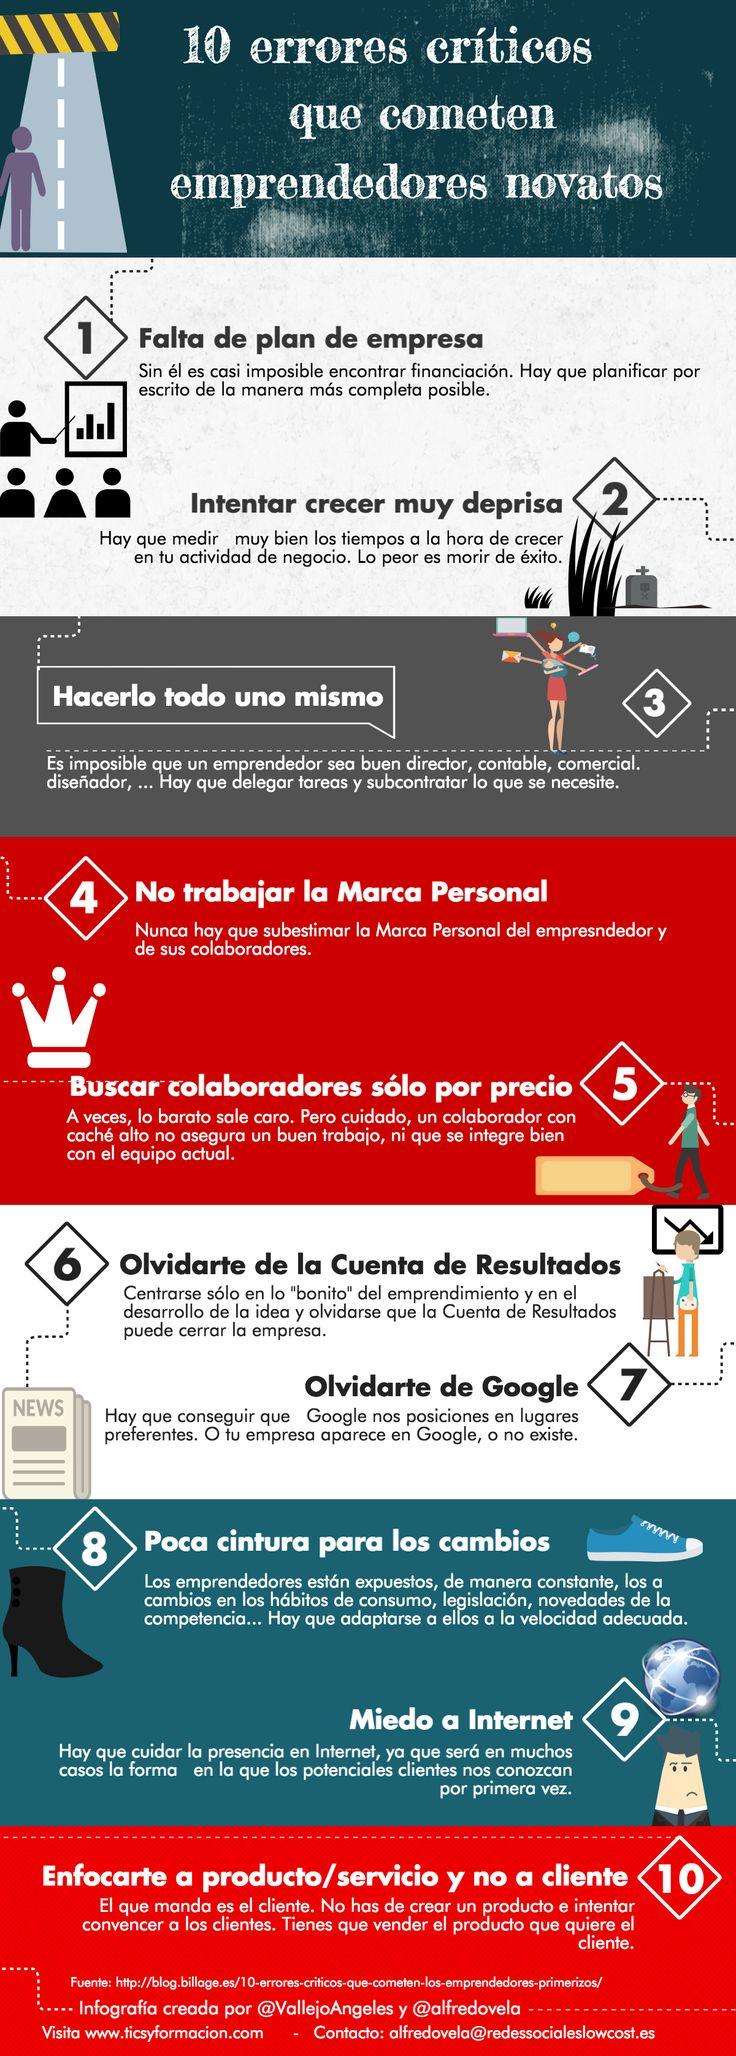 10 errores habituales de los #emprendedores novatos. #Infografia